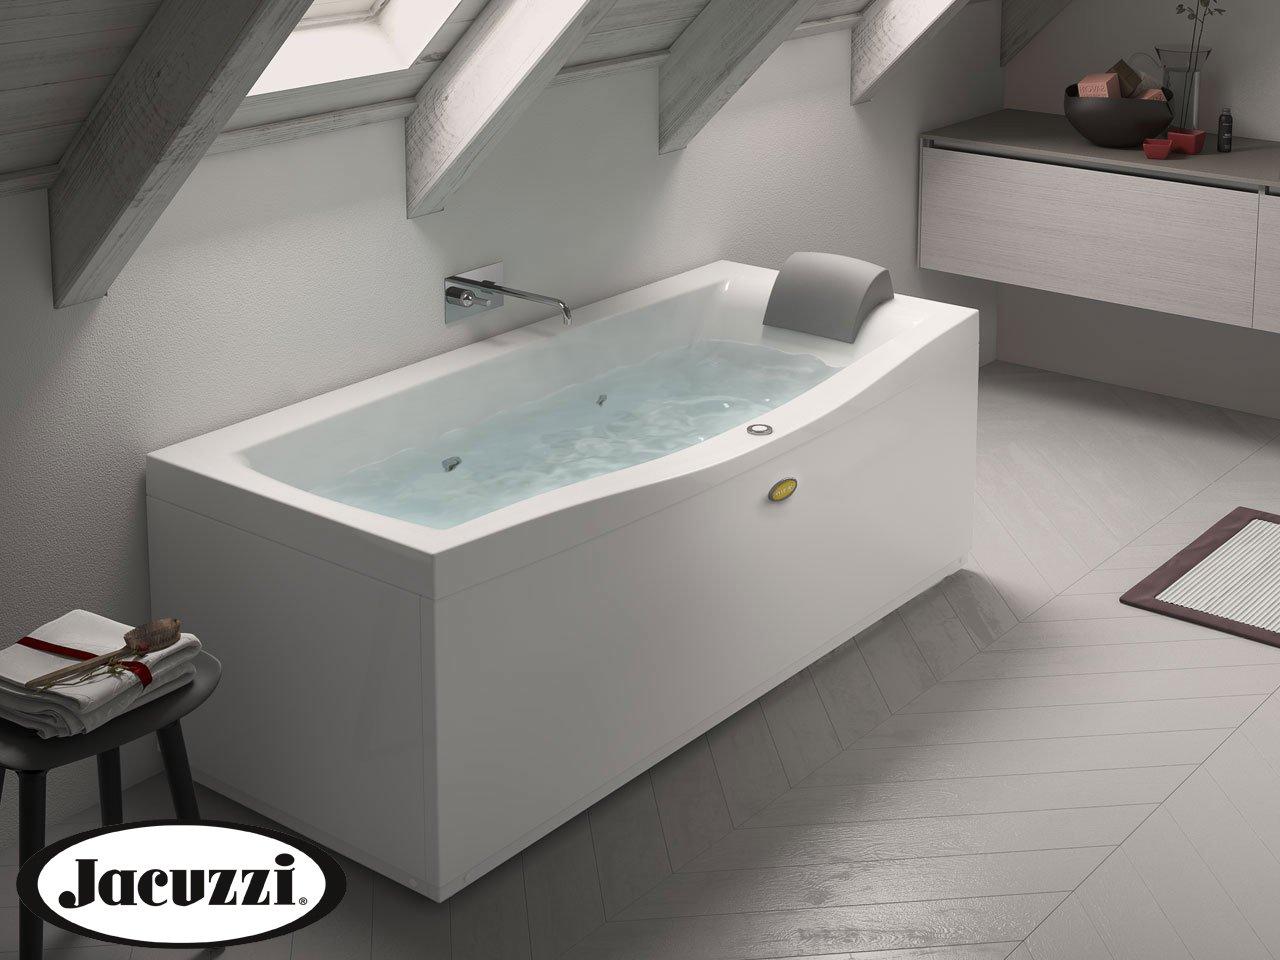 Emejing vasca idromassaggio jacuzzi prezzi gallery - Vasche da bagno jacuzzi prezzi ...